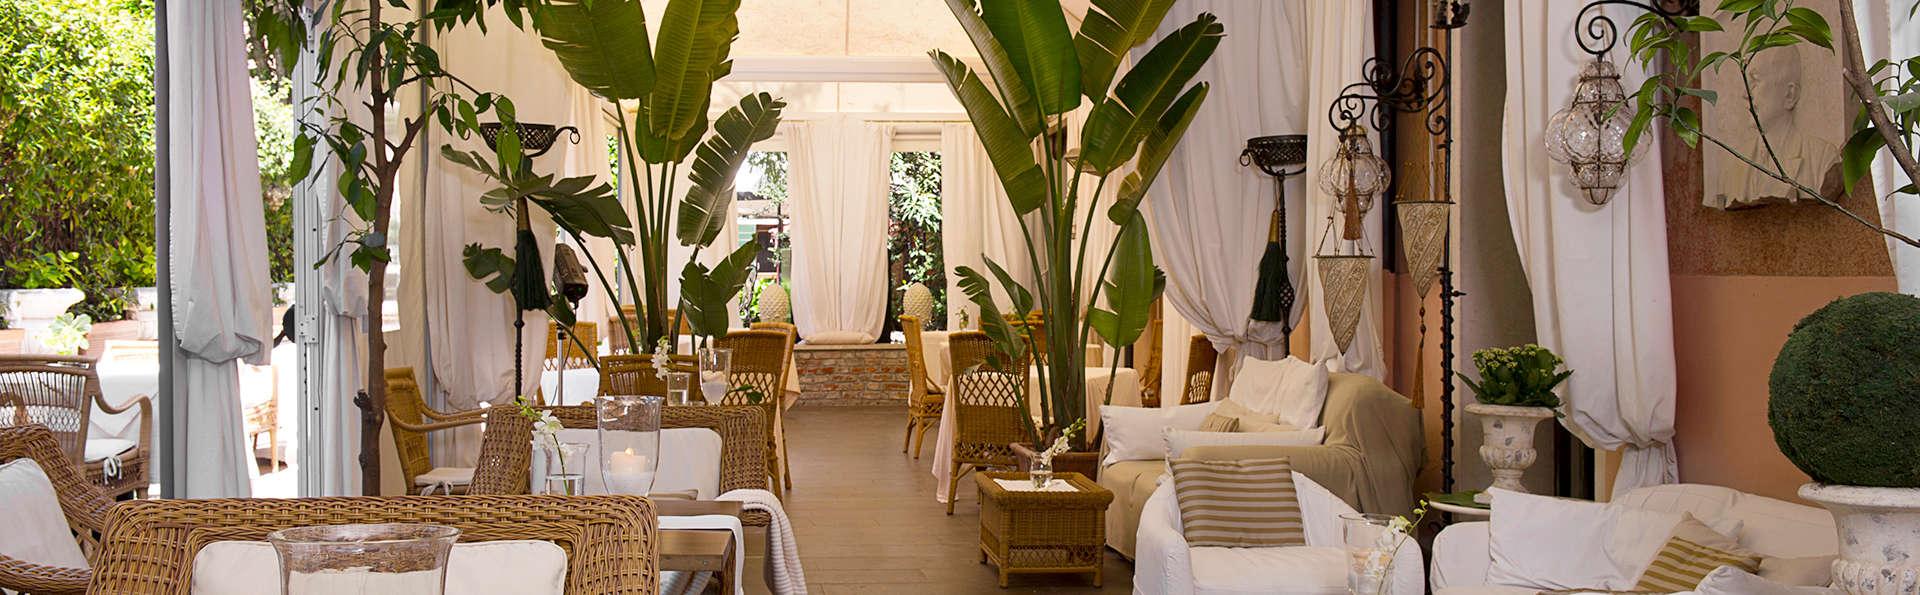 Hotel Metropole Venice - Edit_Terrace2.jpg